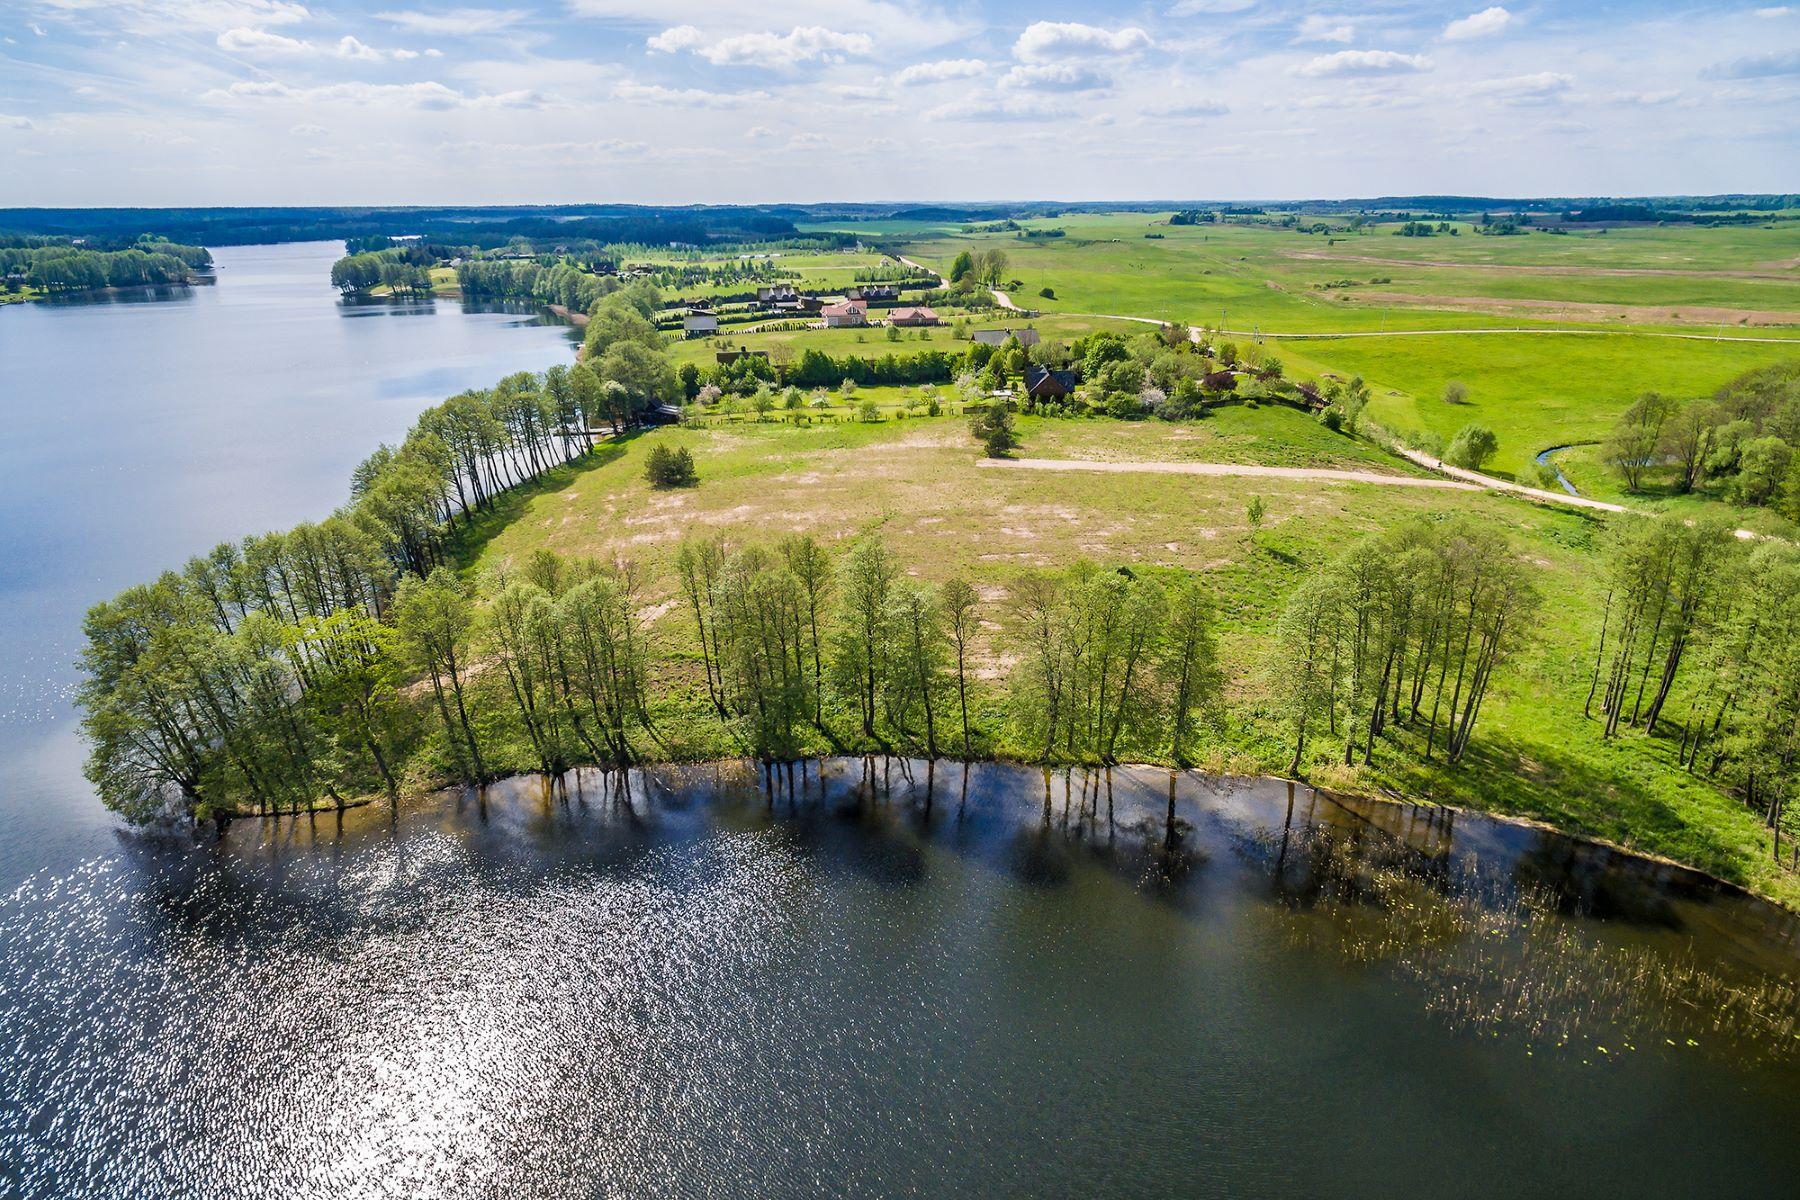 土地 为 销售 在 Outstanding Land Parcel On The Shore Of Lake Margis 立陶宛其他城市, 立陶宛城市, 立陶宛